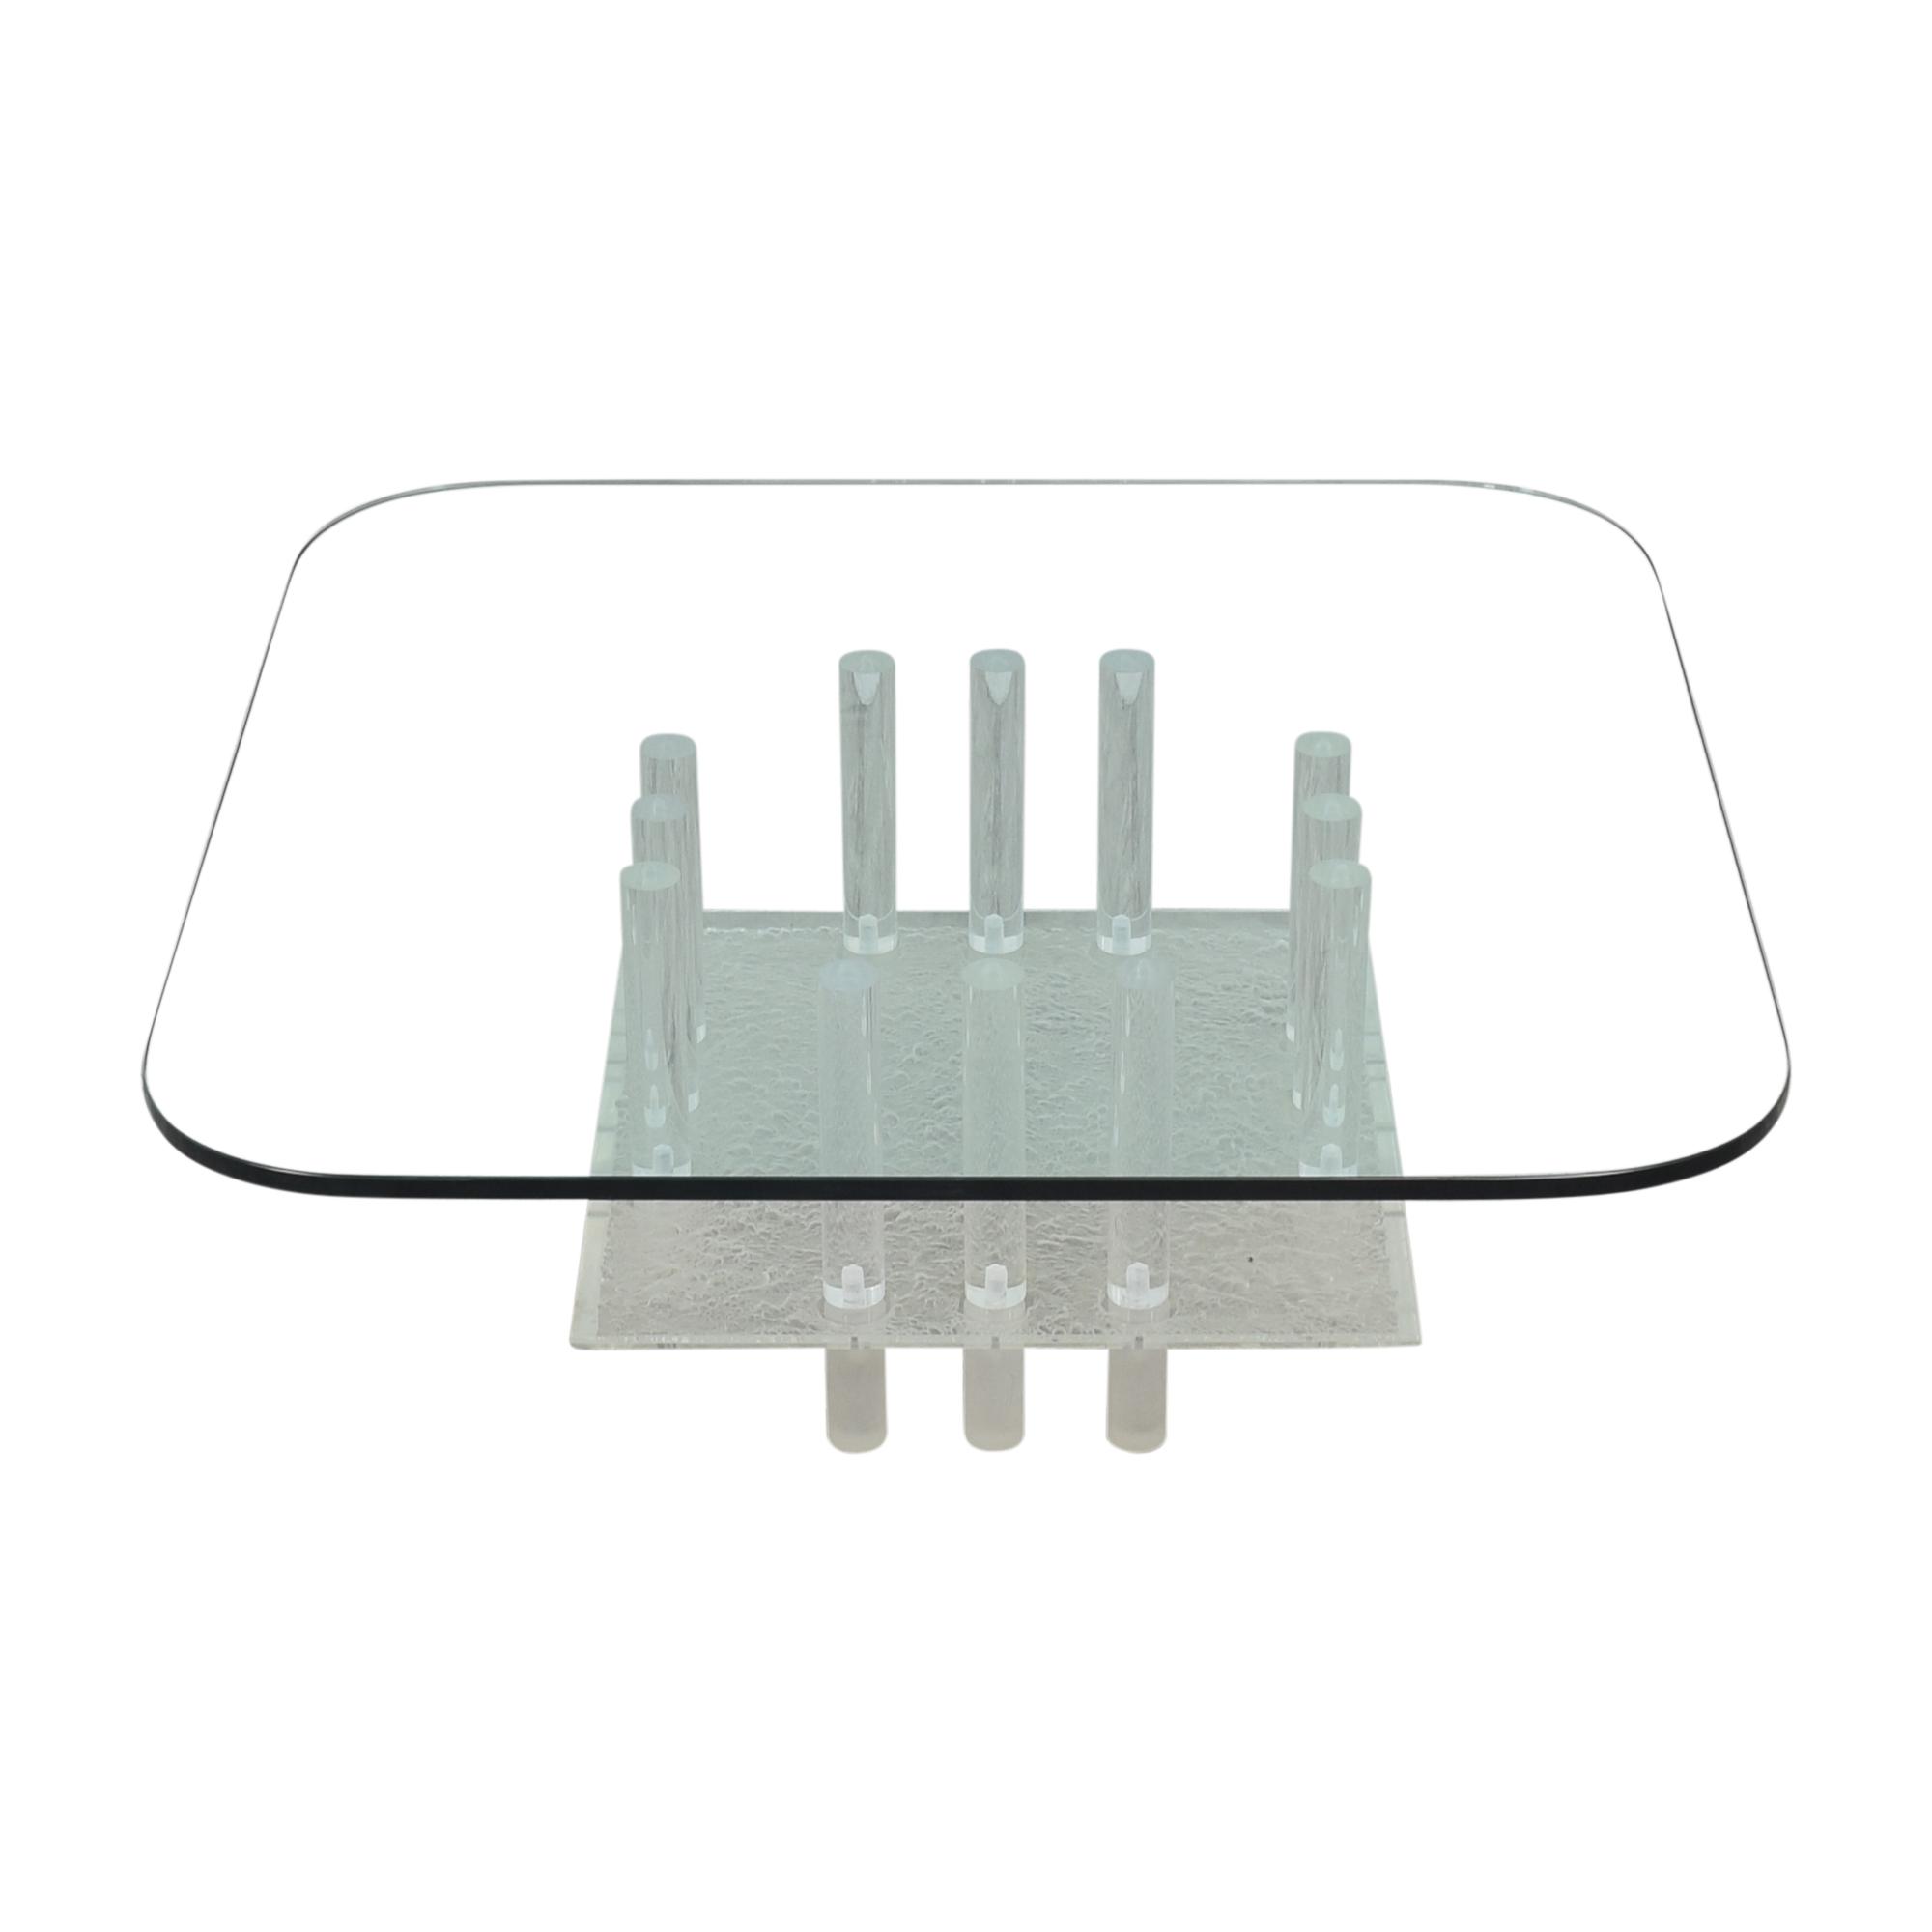 Directional Furniture Directional Furniture Glass Coffee Table ma